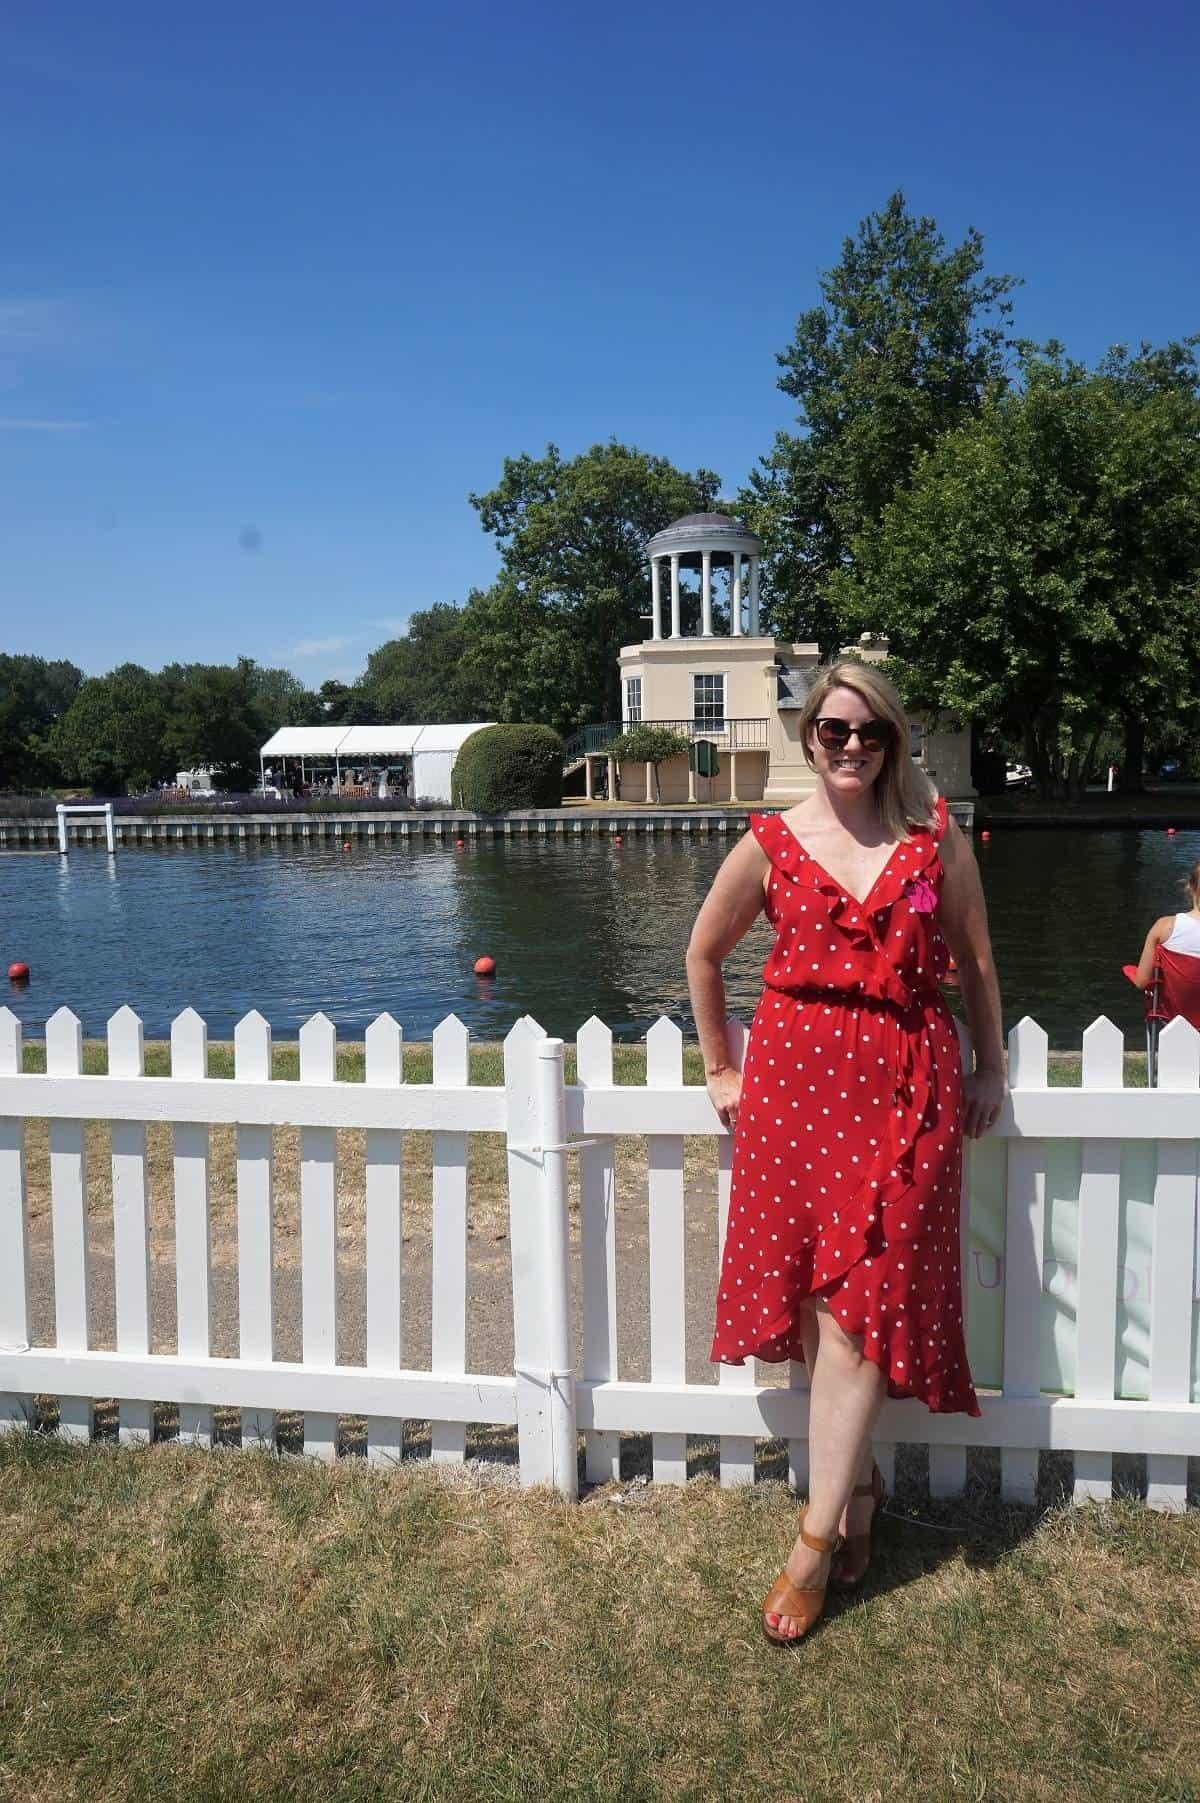 Polka Dot Oasis dress from Debenhams